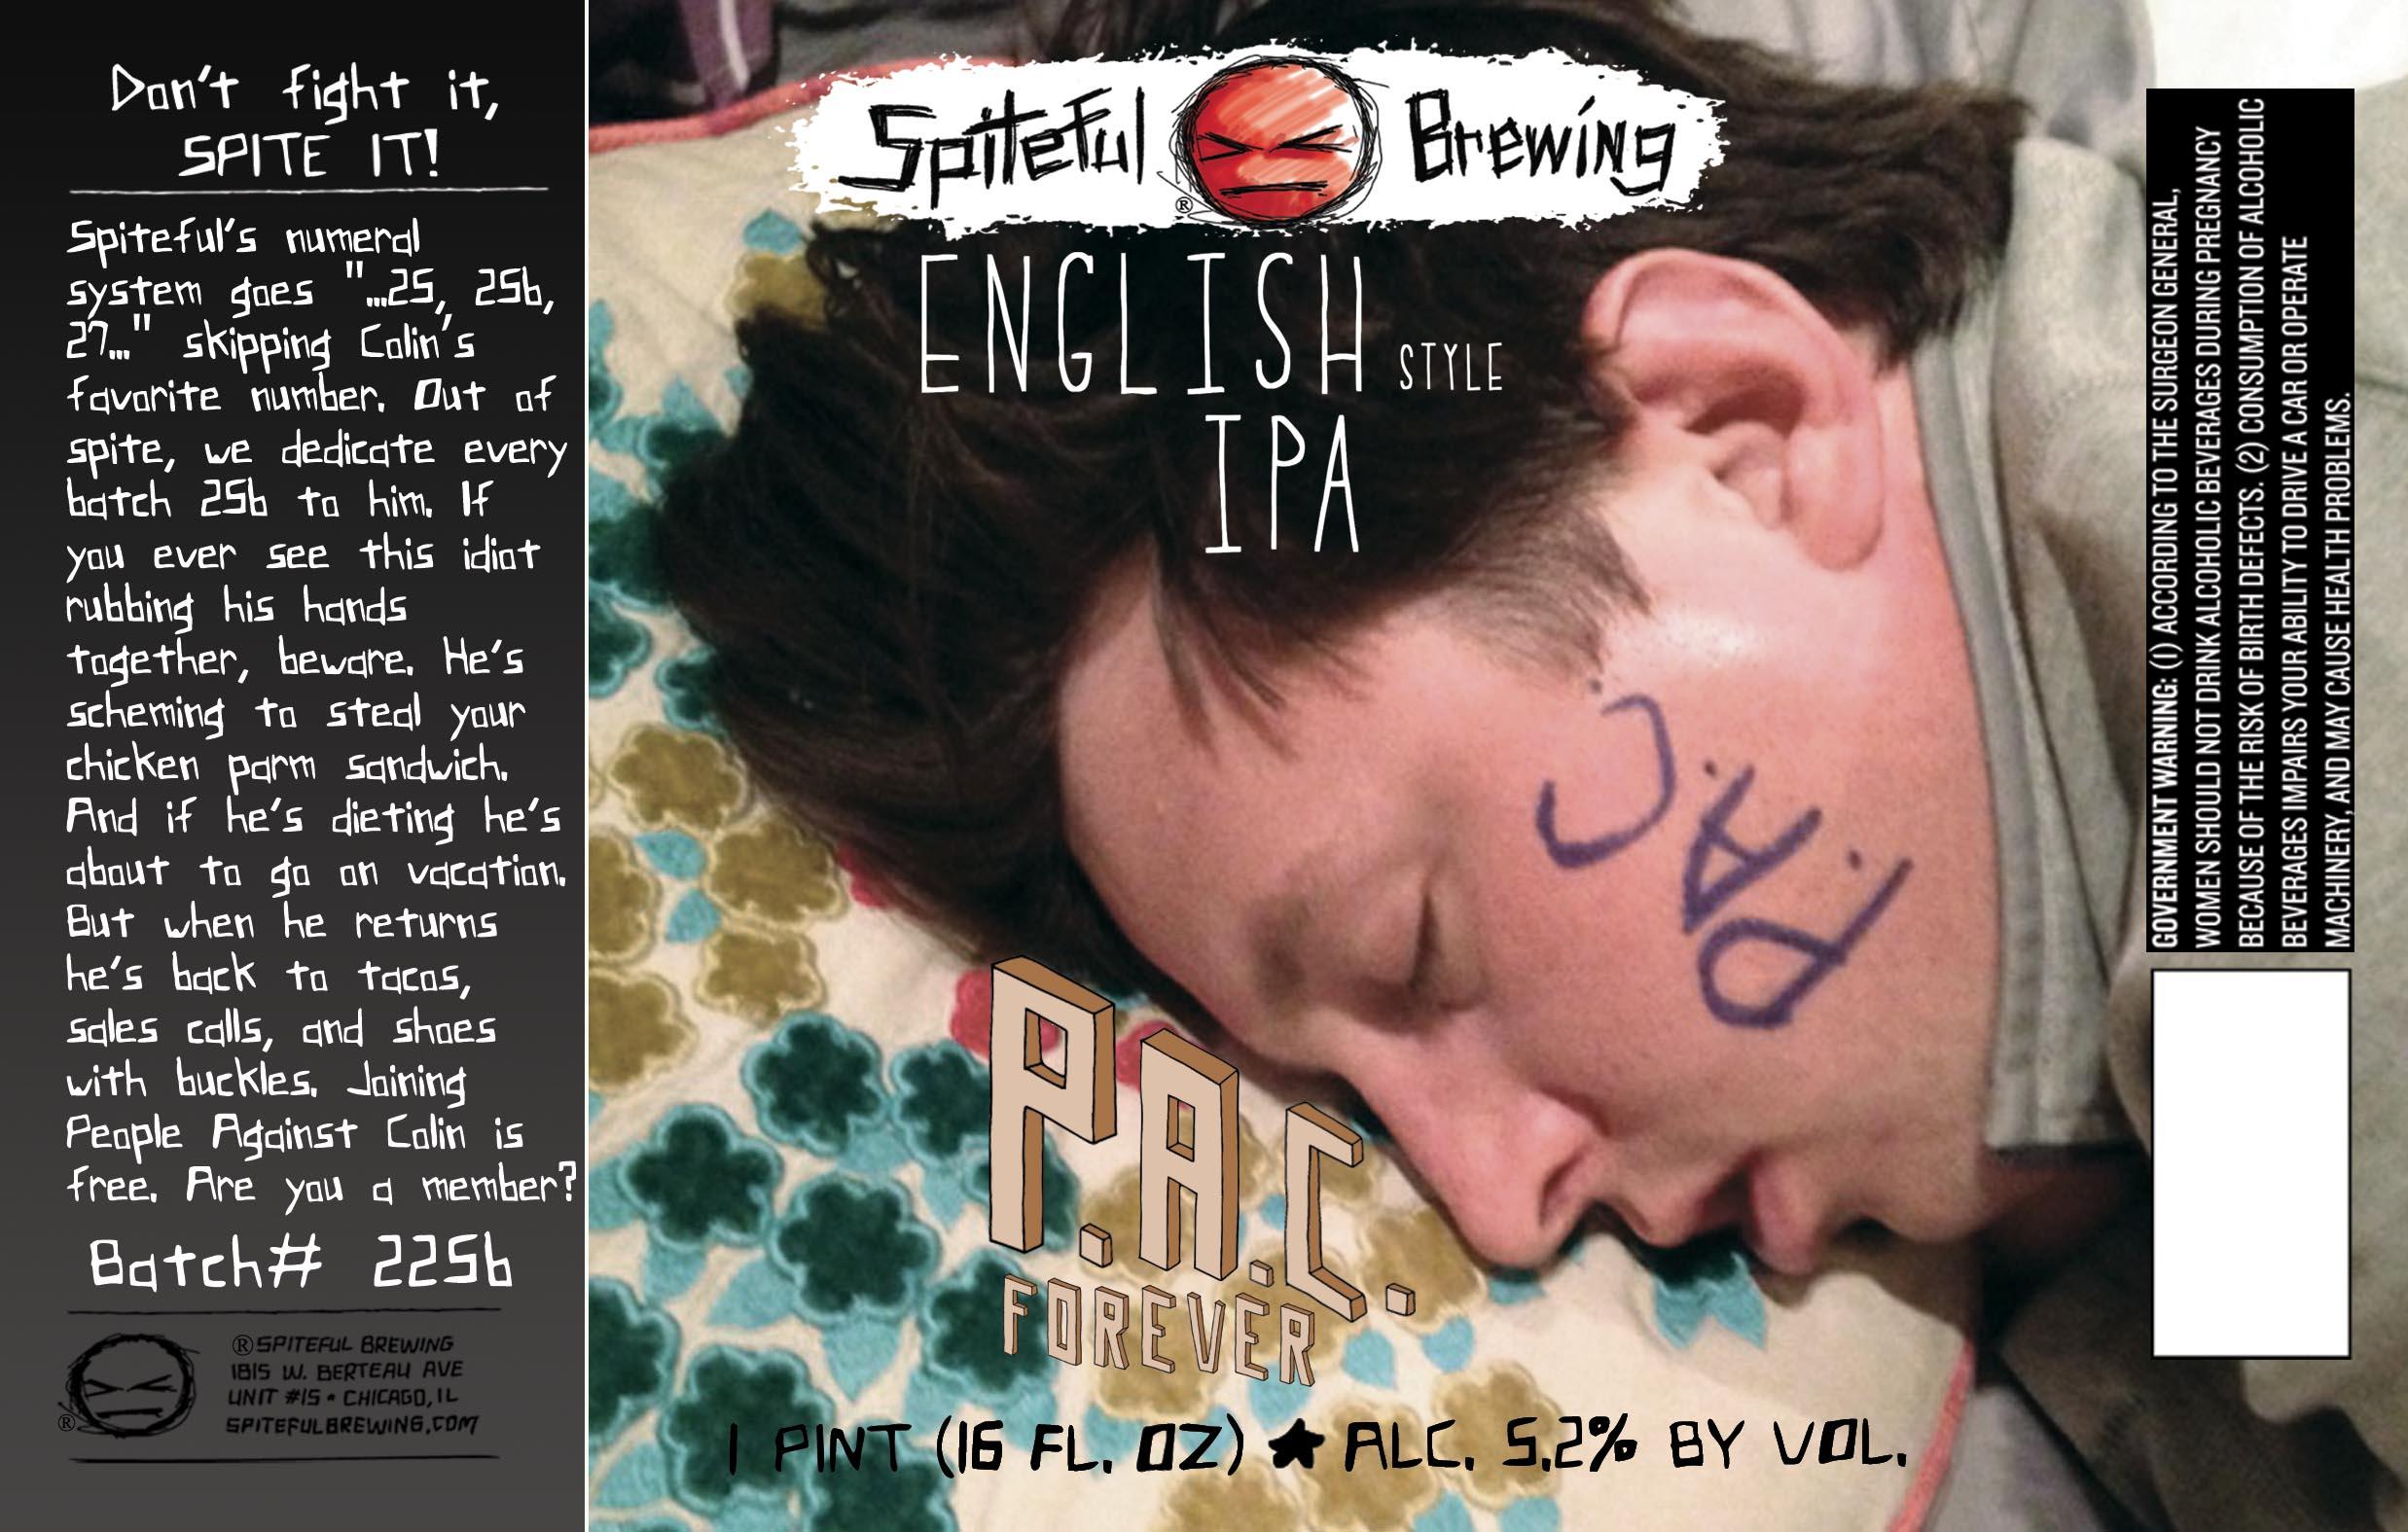 PAC English IPA.jpg